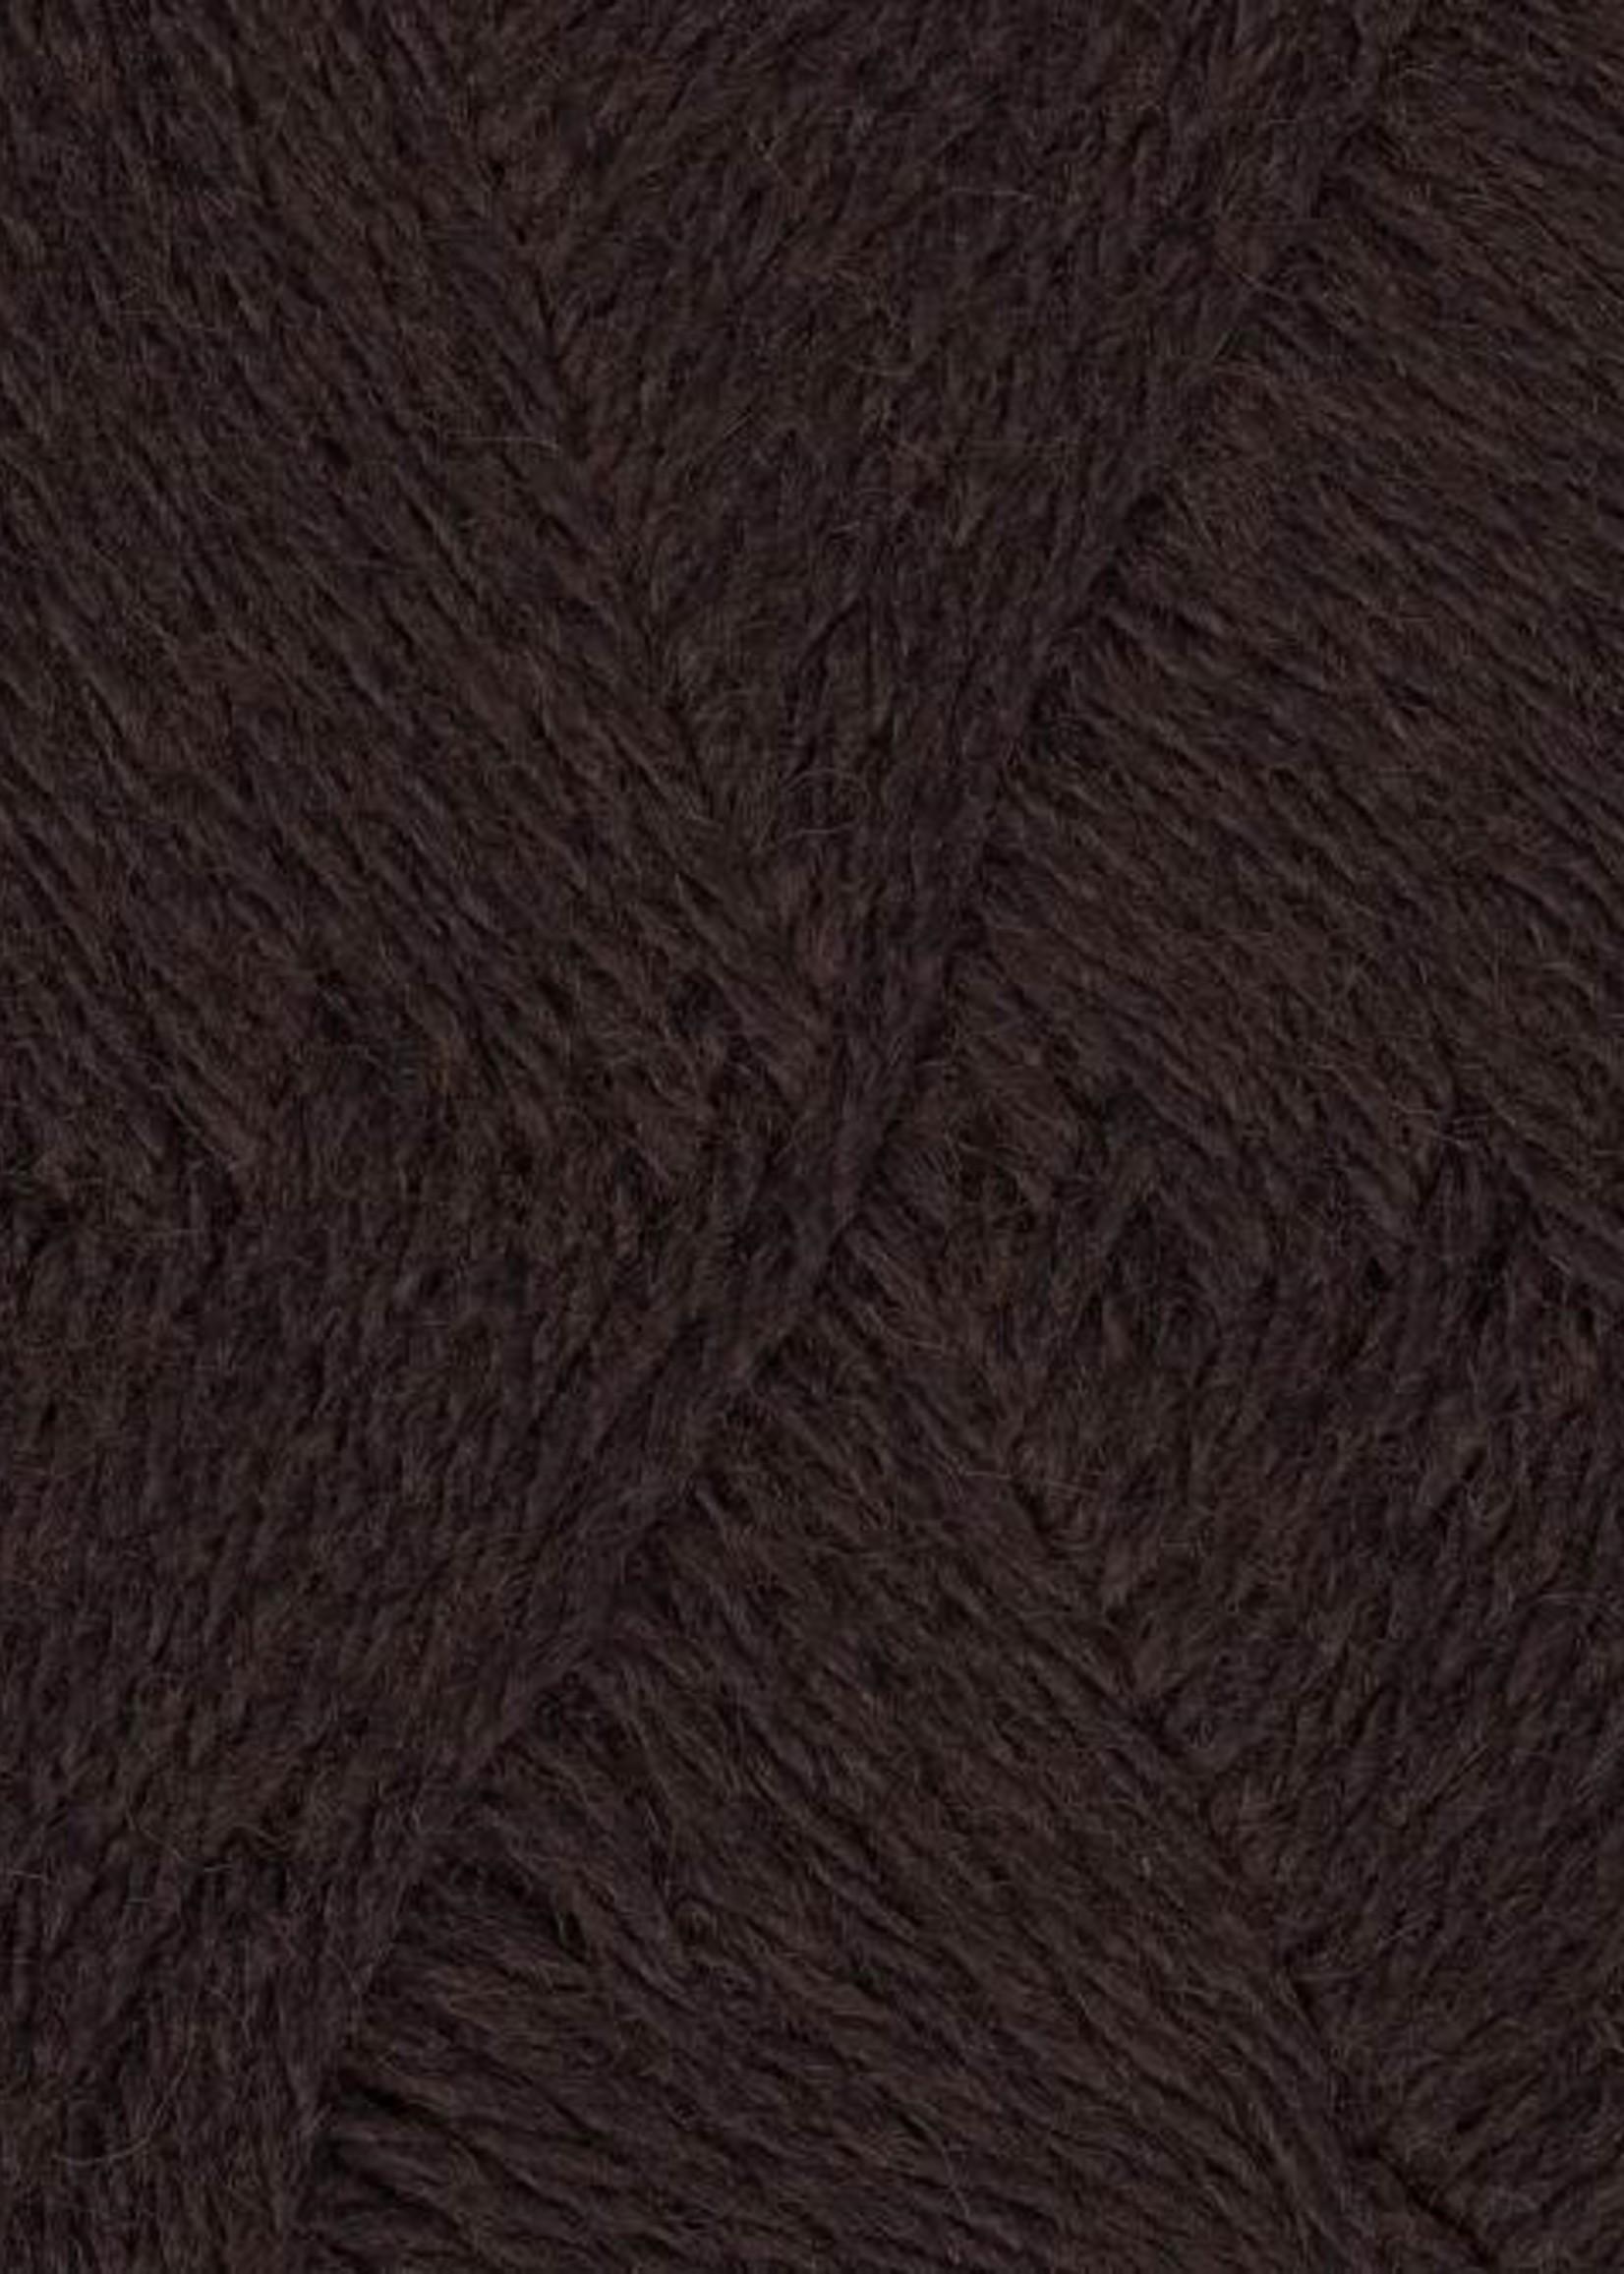 Knitting Fever KFI Collection Teenie Weenie Wool - Coffee